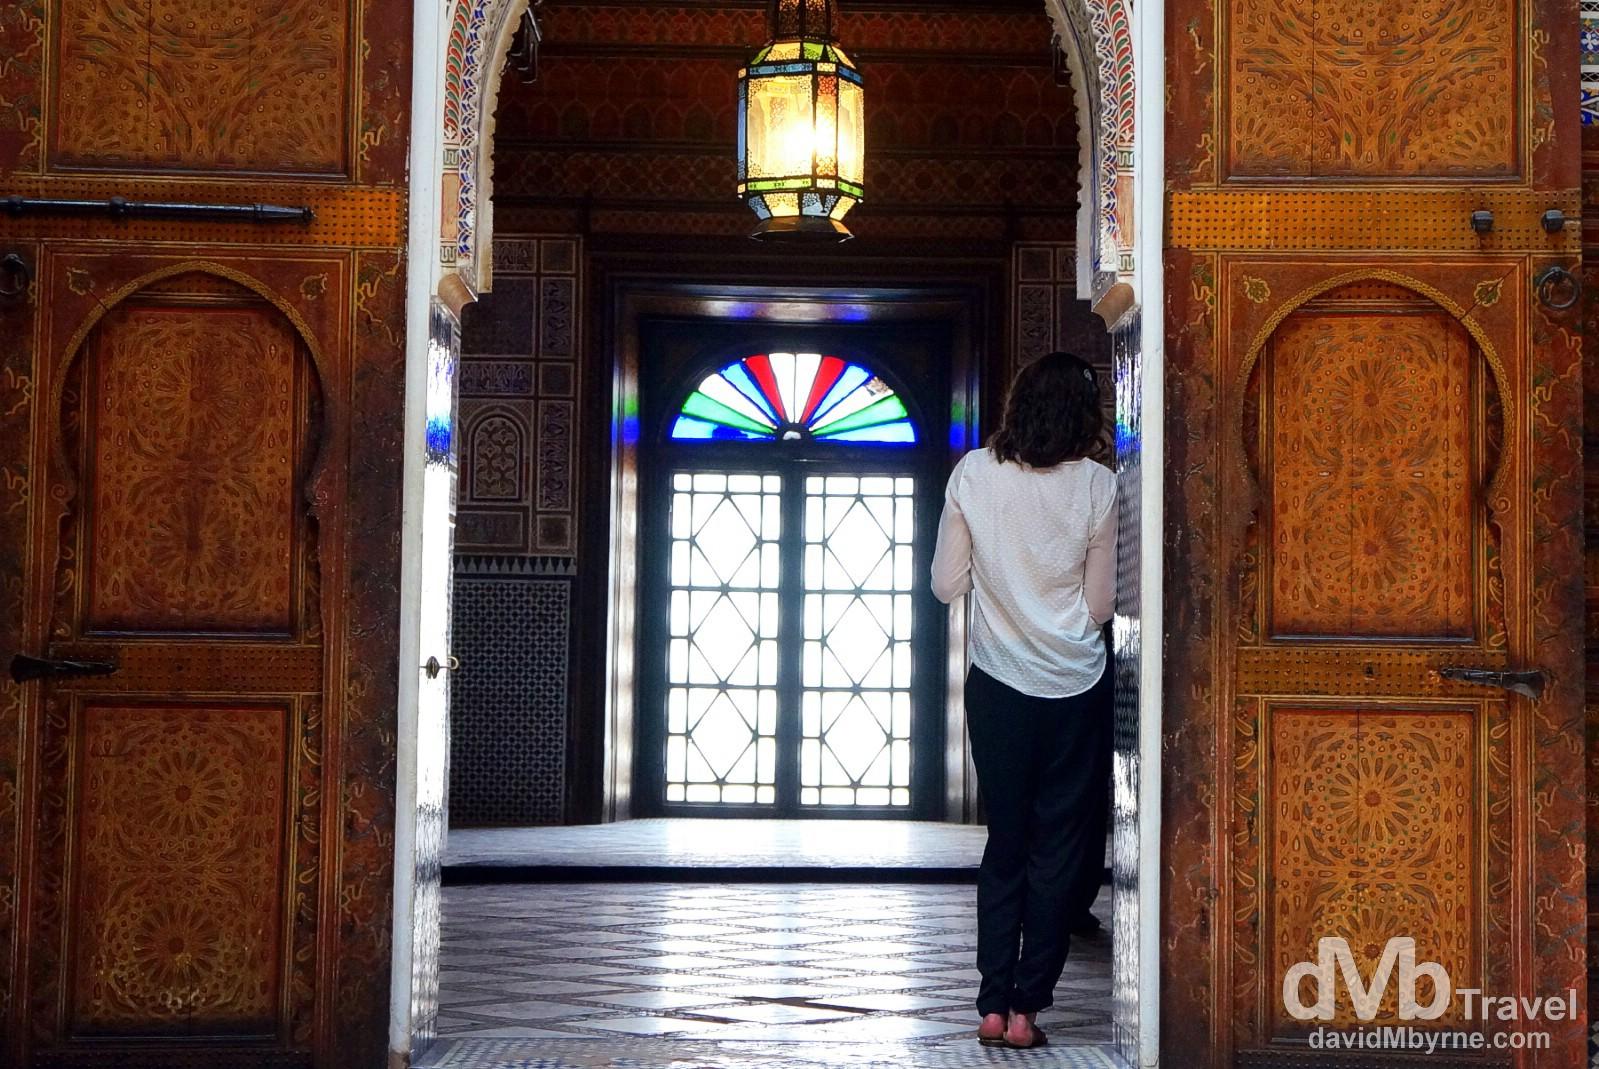 In the Dar Si Said, Marrakesh, Morocco. May 7th, 2014.